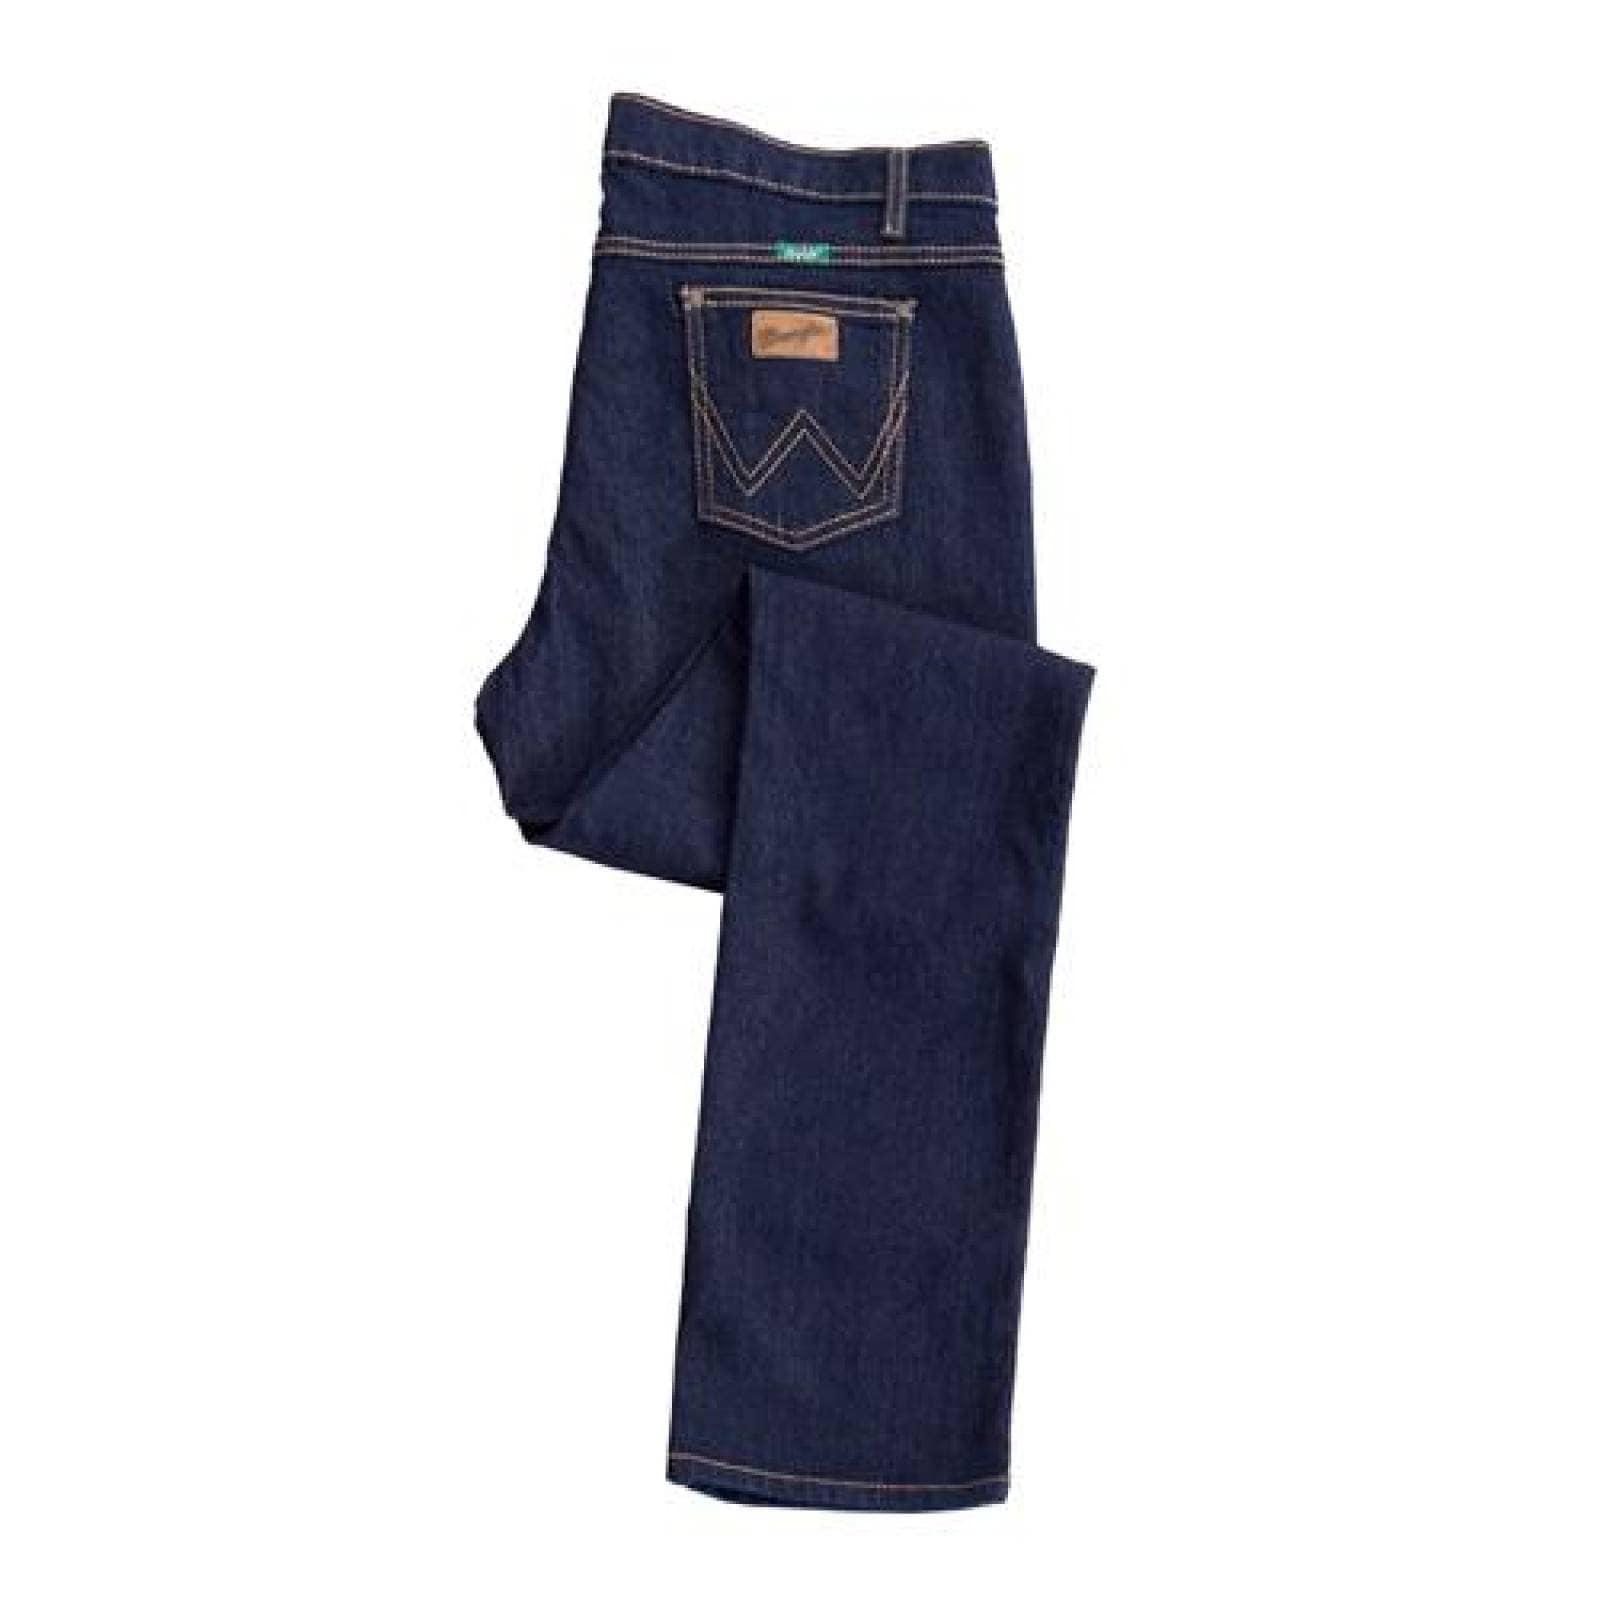 Jeans Vaquero Wrangler Mujer Slim Fit B40